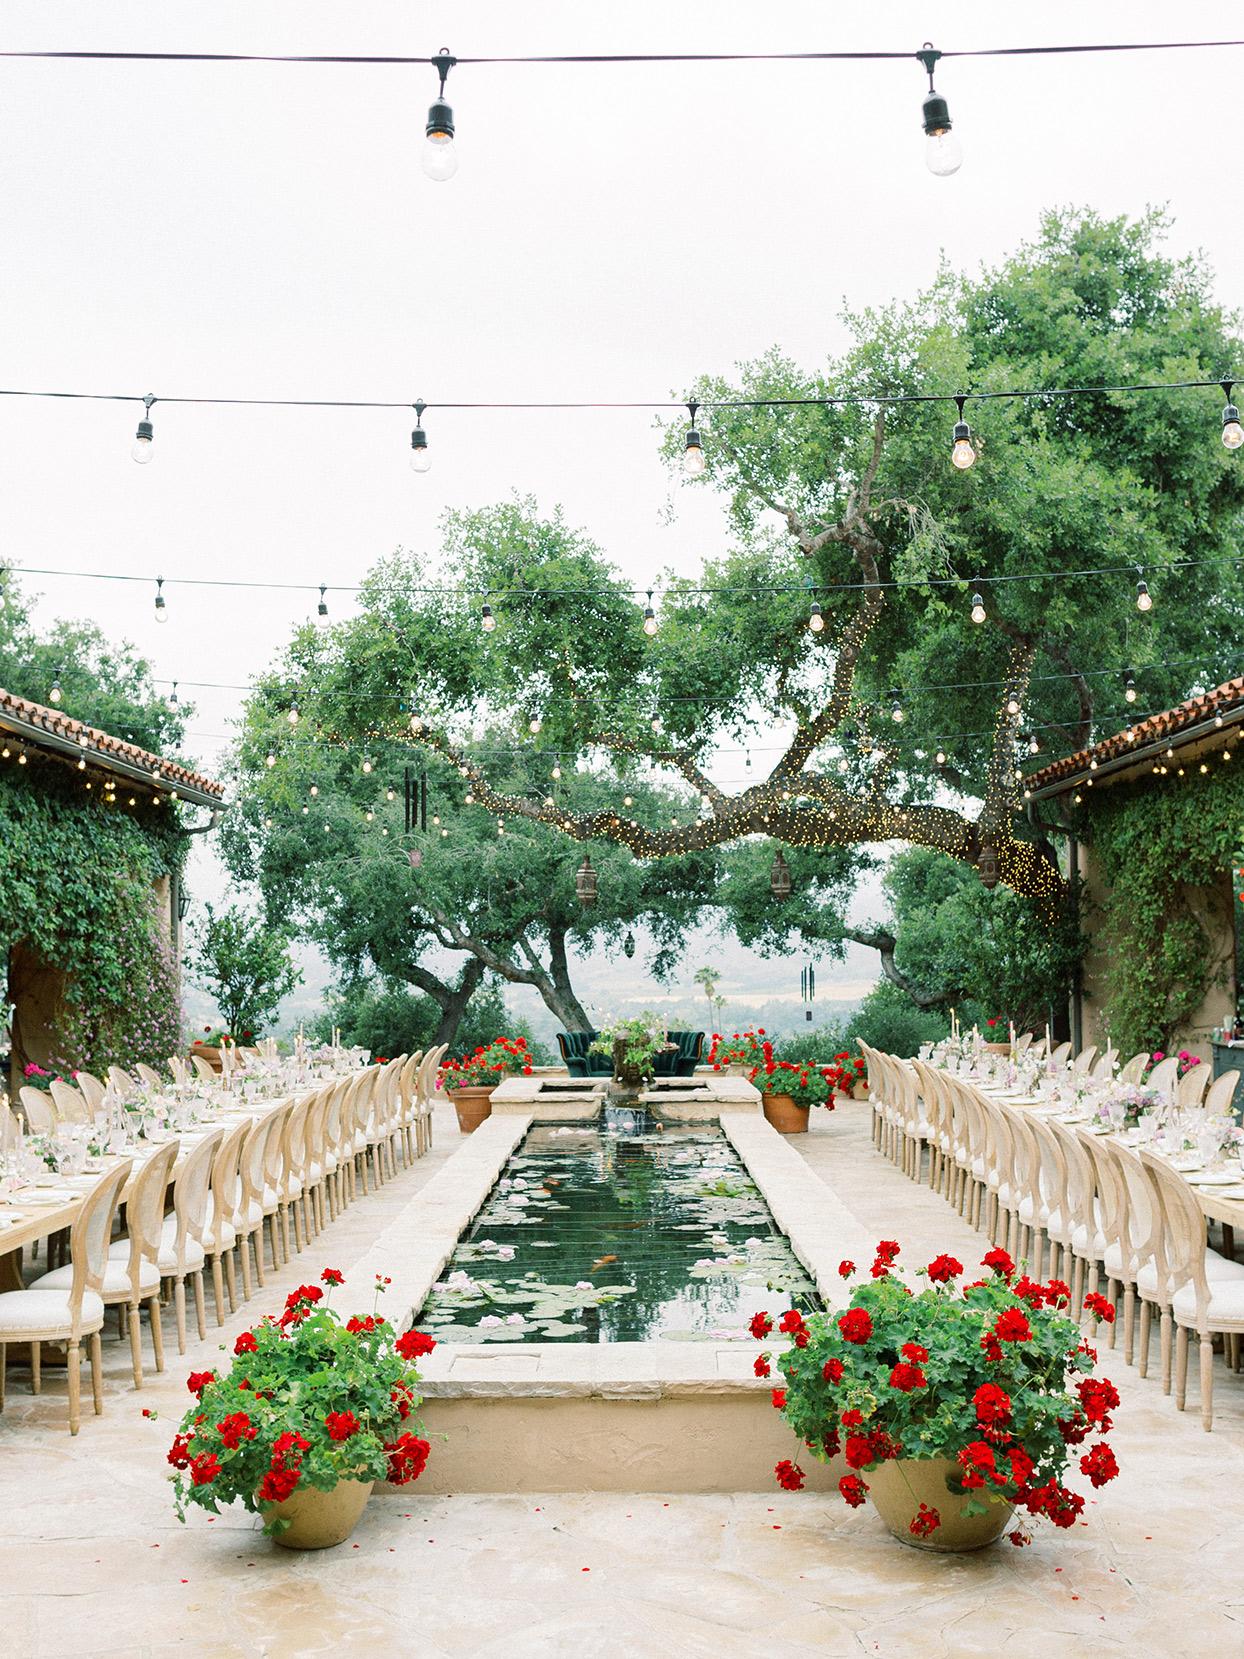 raina salih wedding reception long tables and lily pond